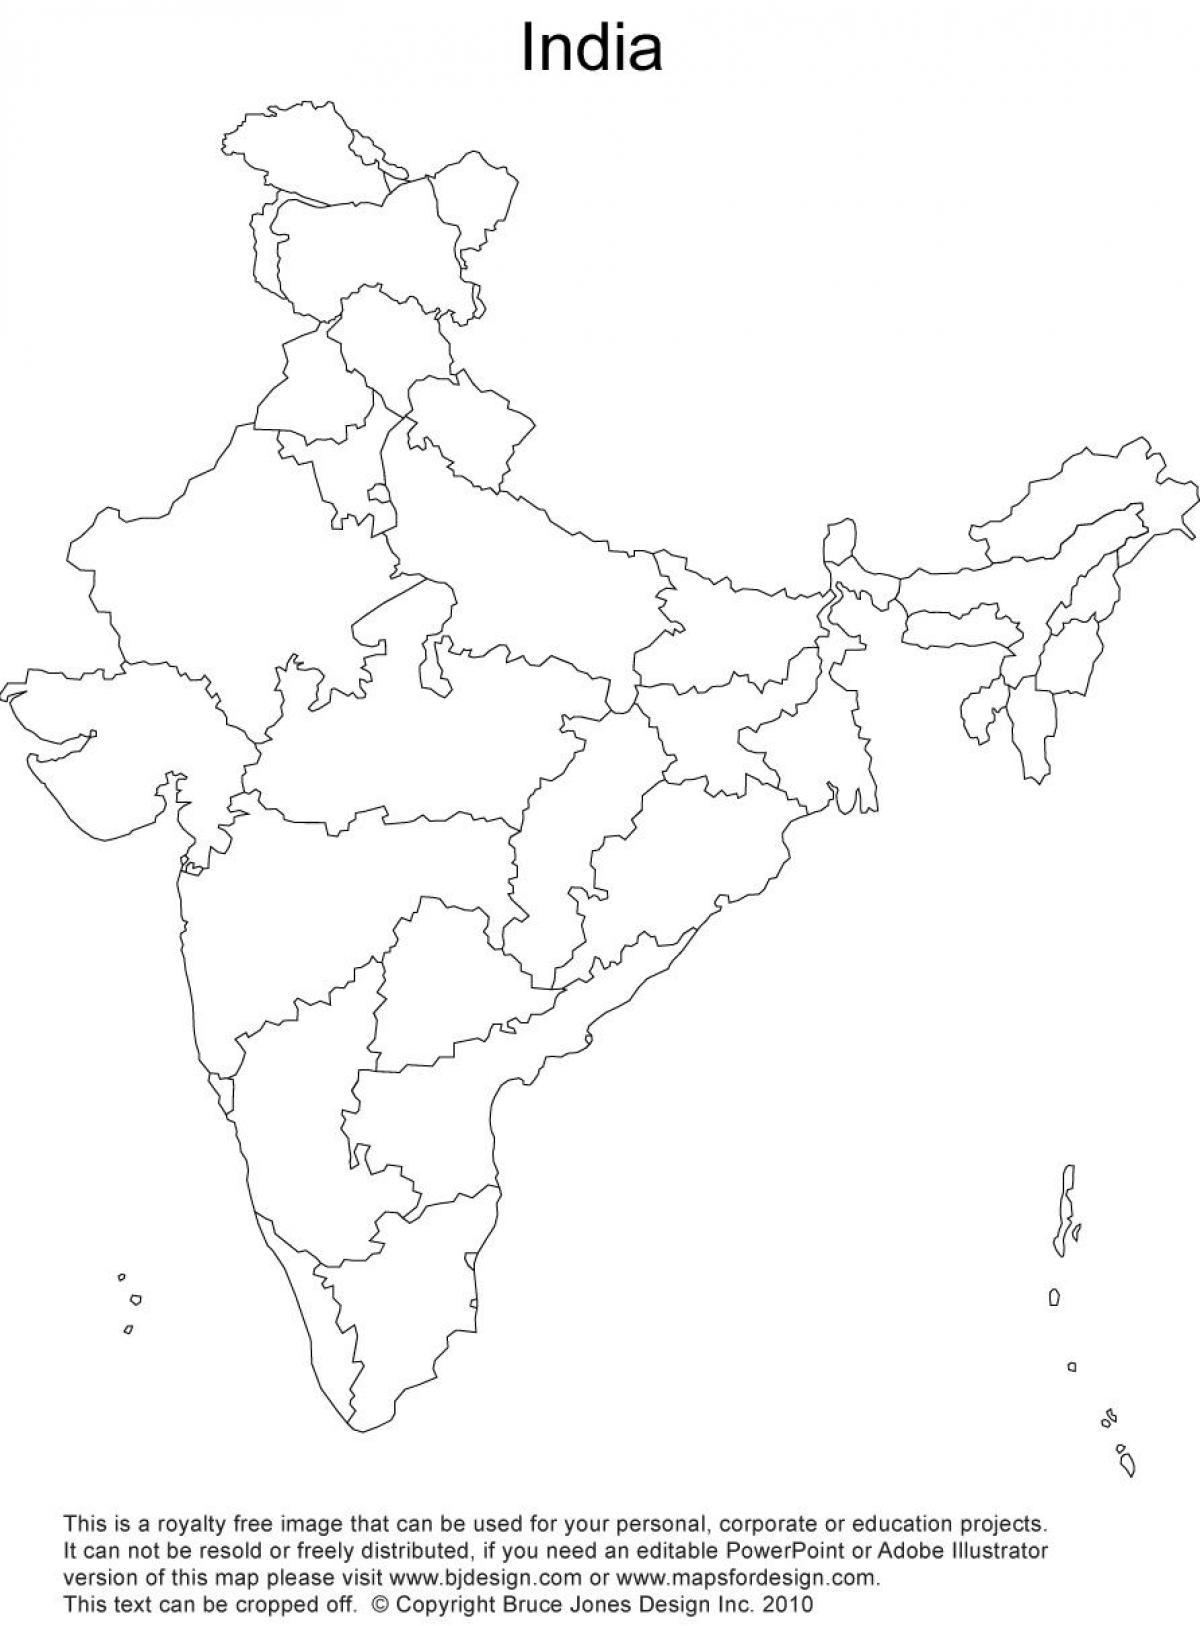 India Political Map Outline India Political Outline Map - Political map outline